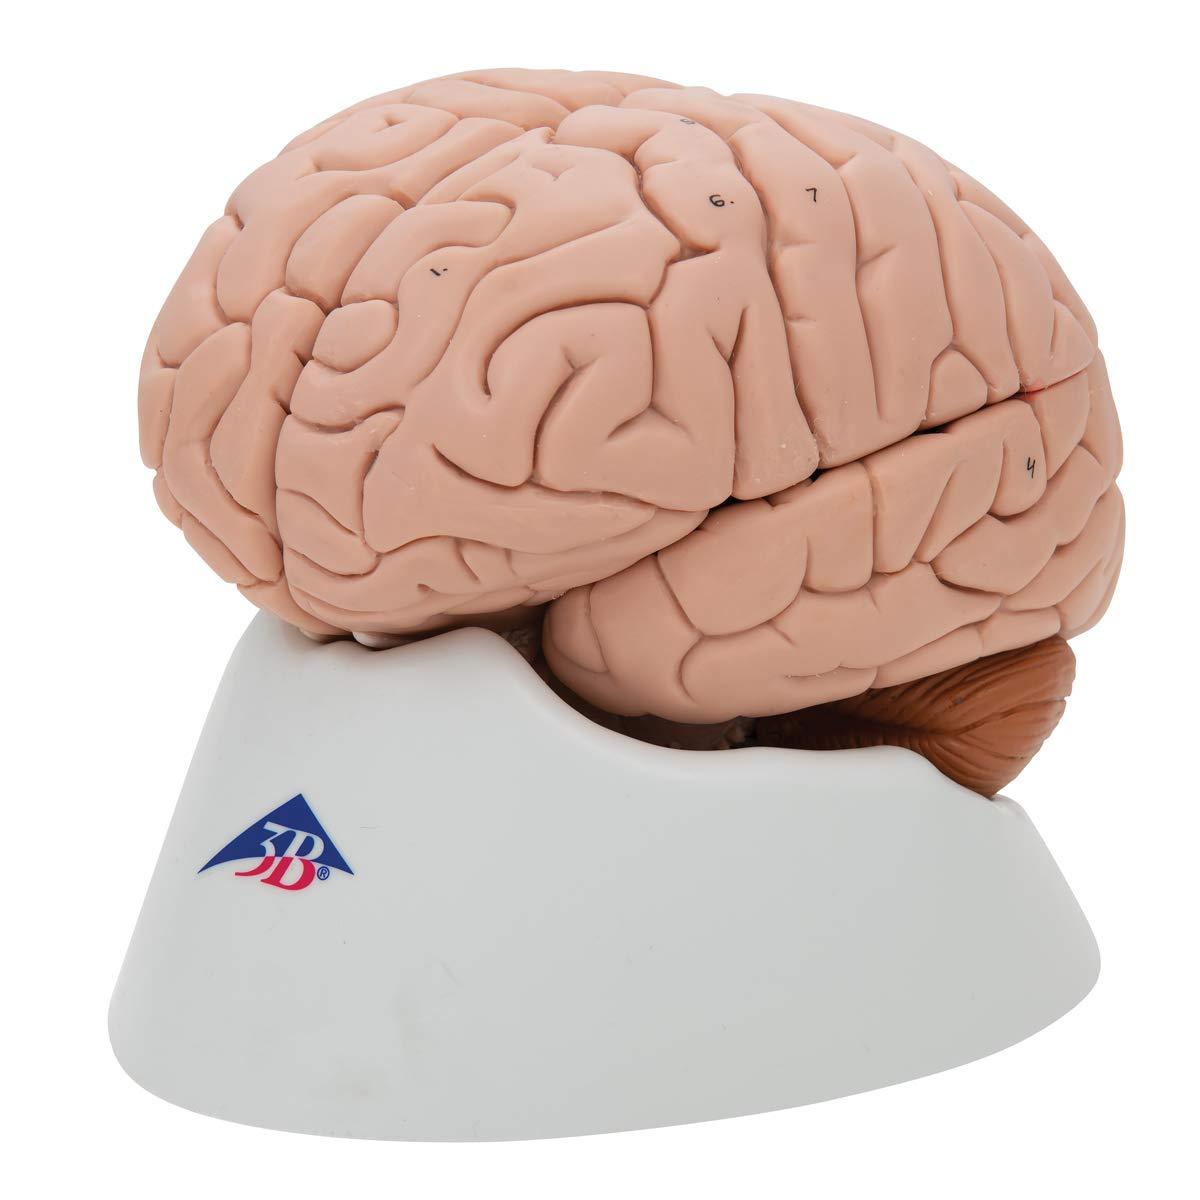 3B Scientific Deluxe 8-Part Brain by 3B Scientific (Image #4)